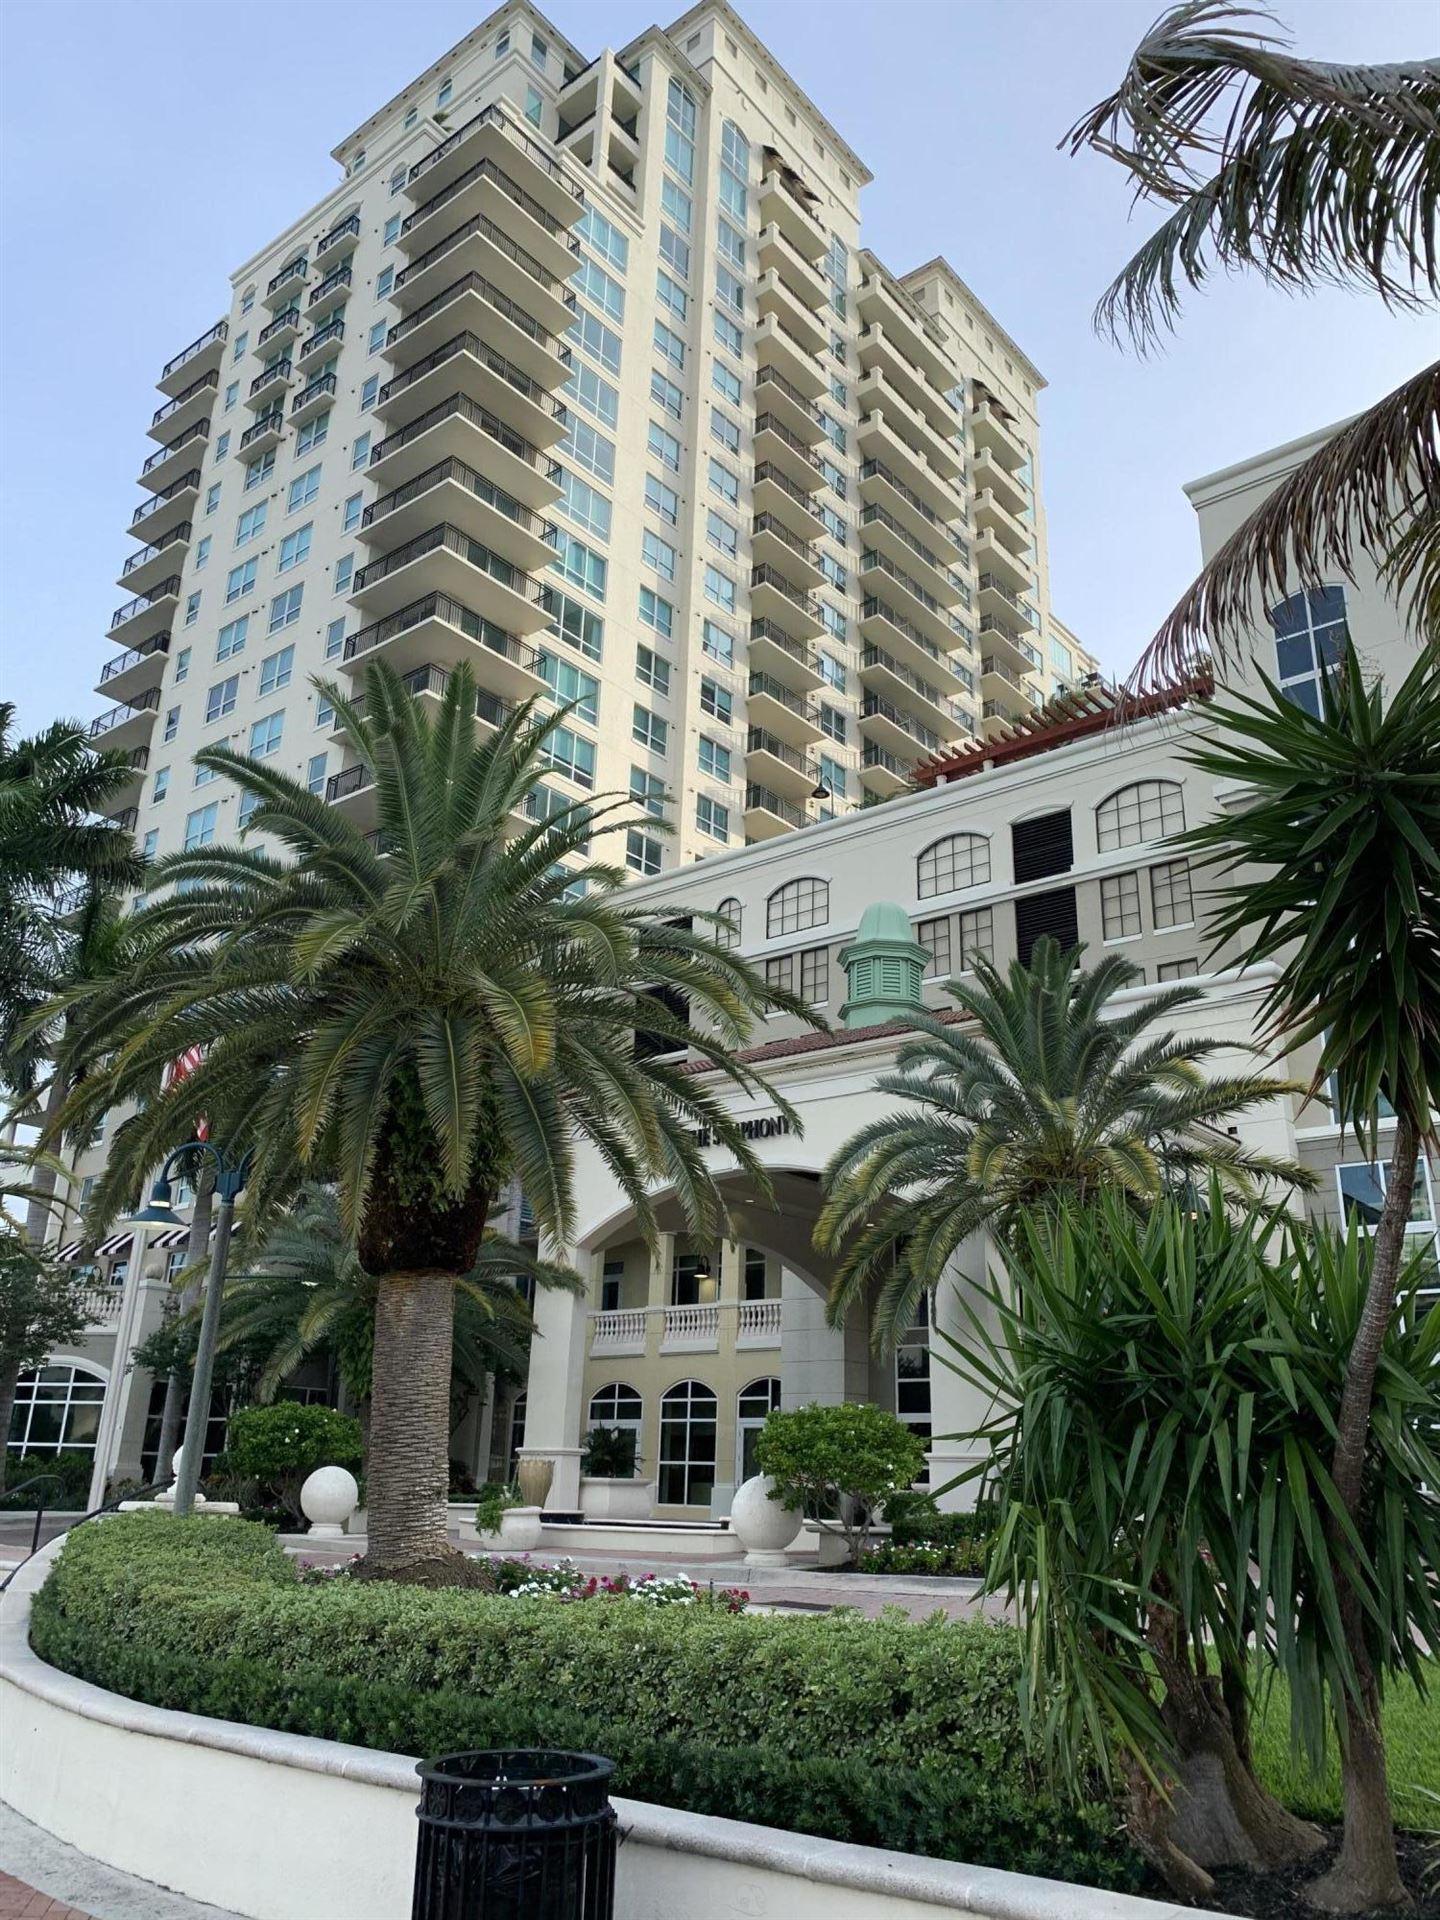 600 W Las Olas Boulevard #2202s, Fort Lauderdale, FL 33312 - #: RX-10626651